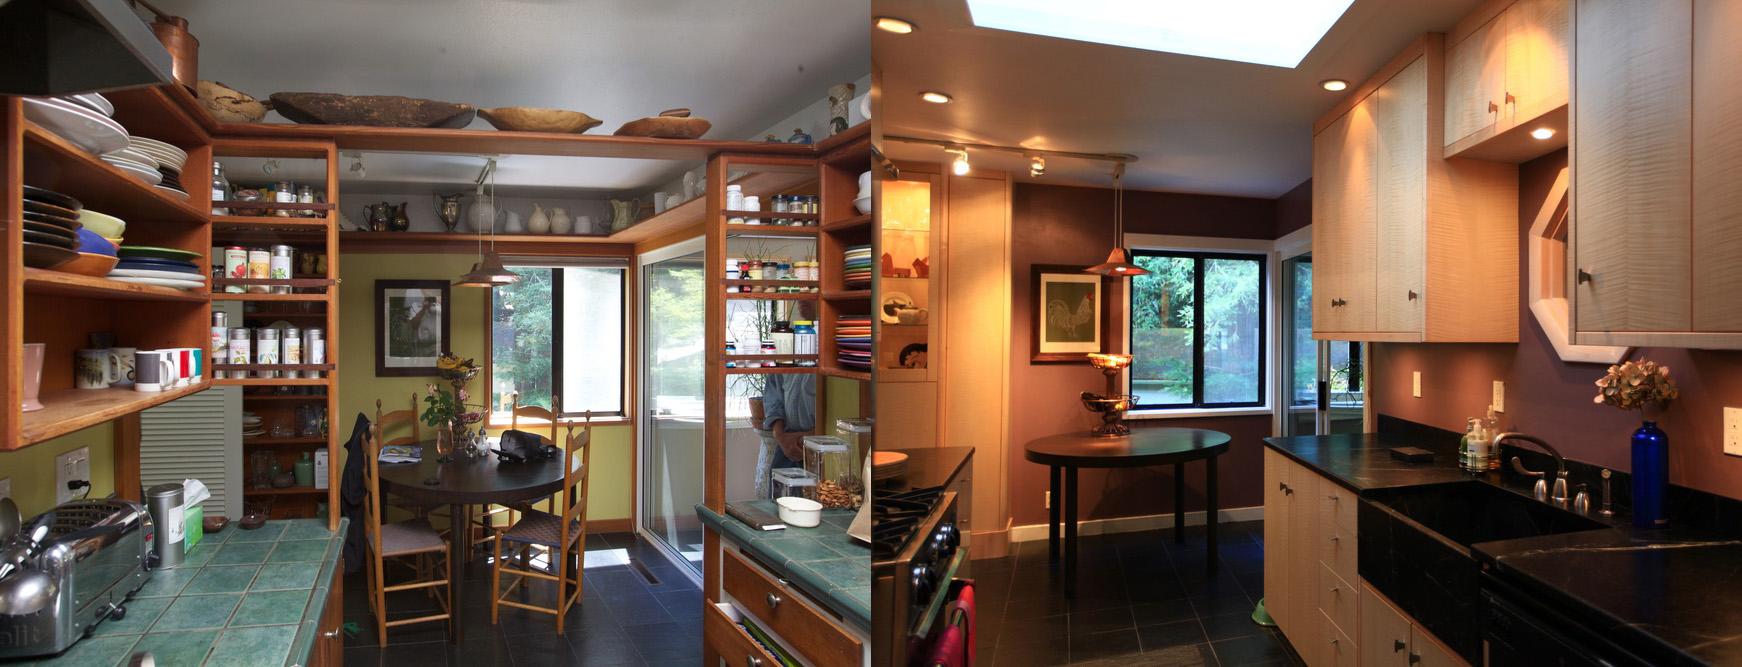 Kitchen2_Both.jpg